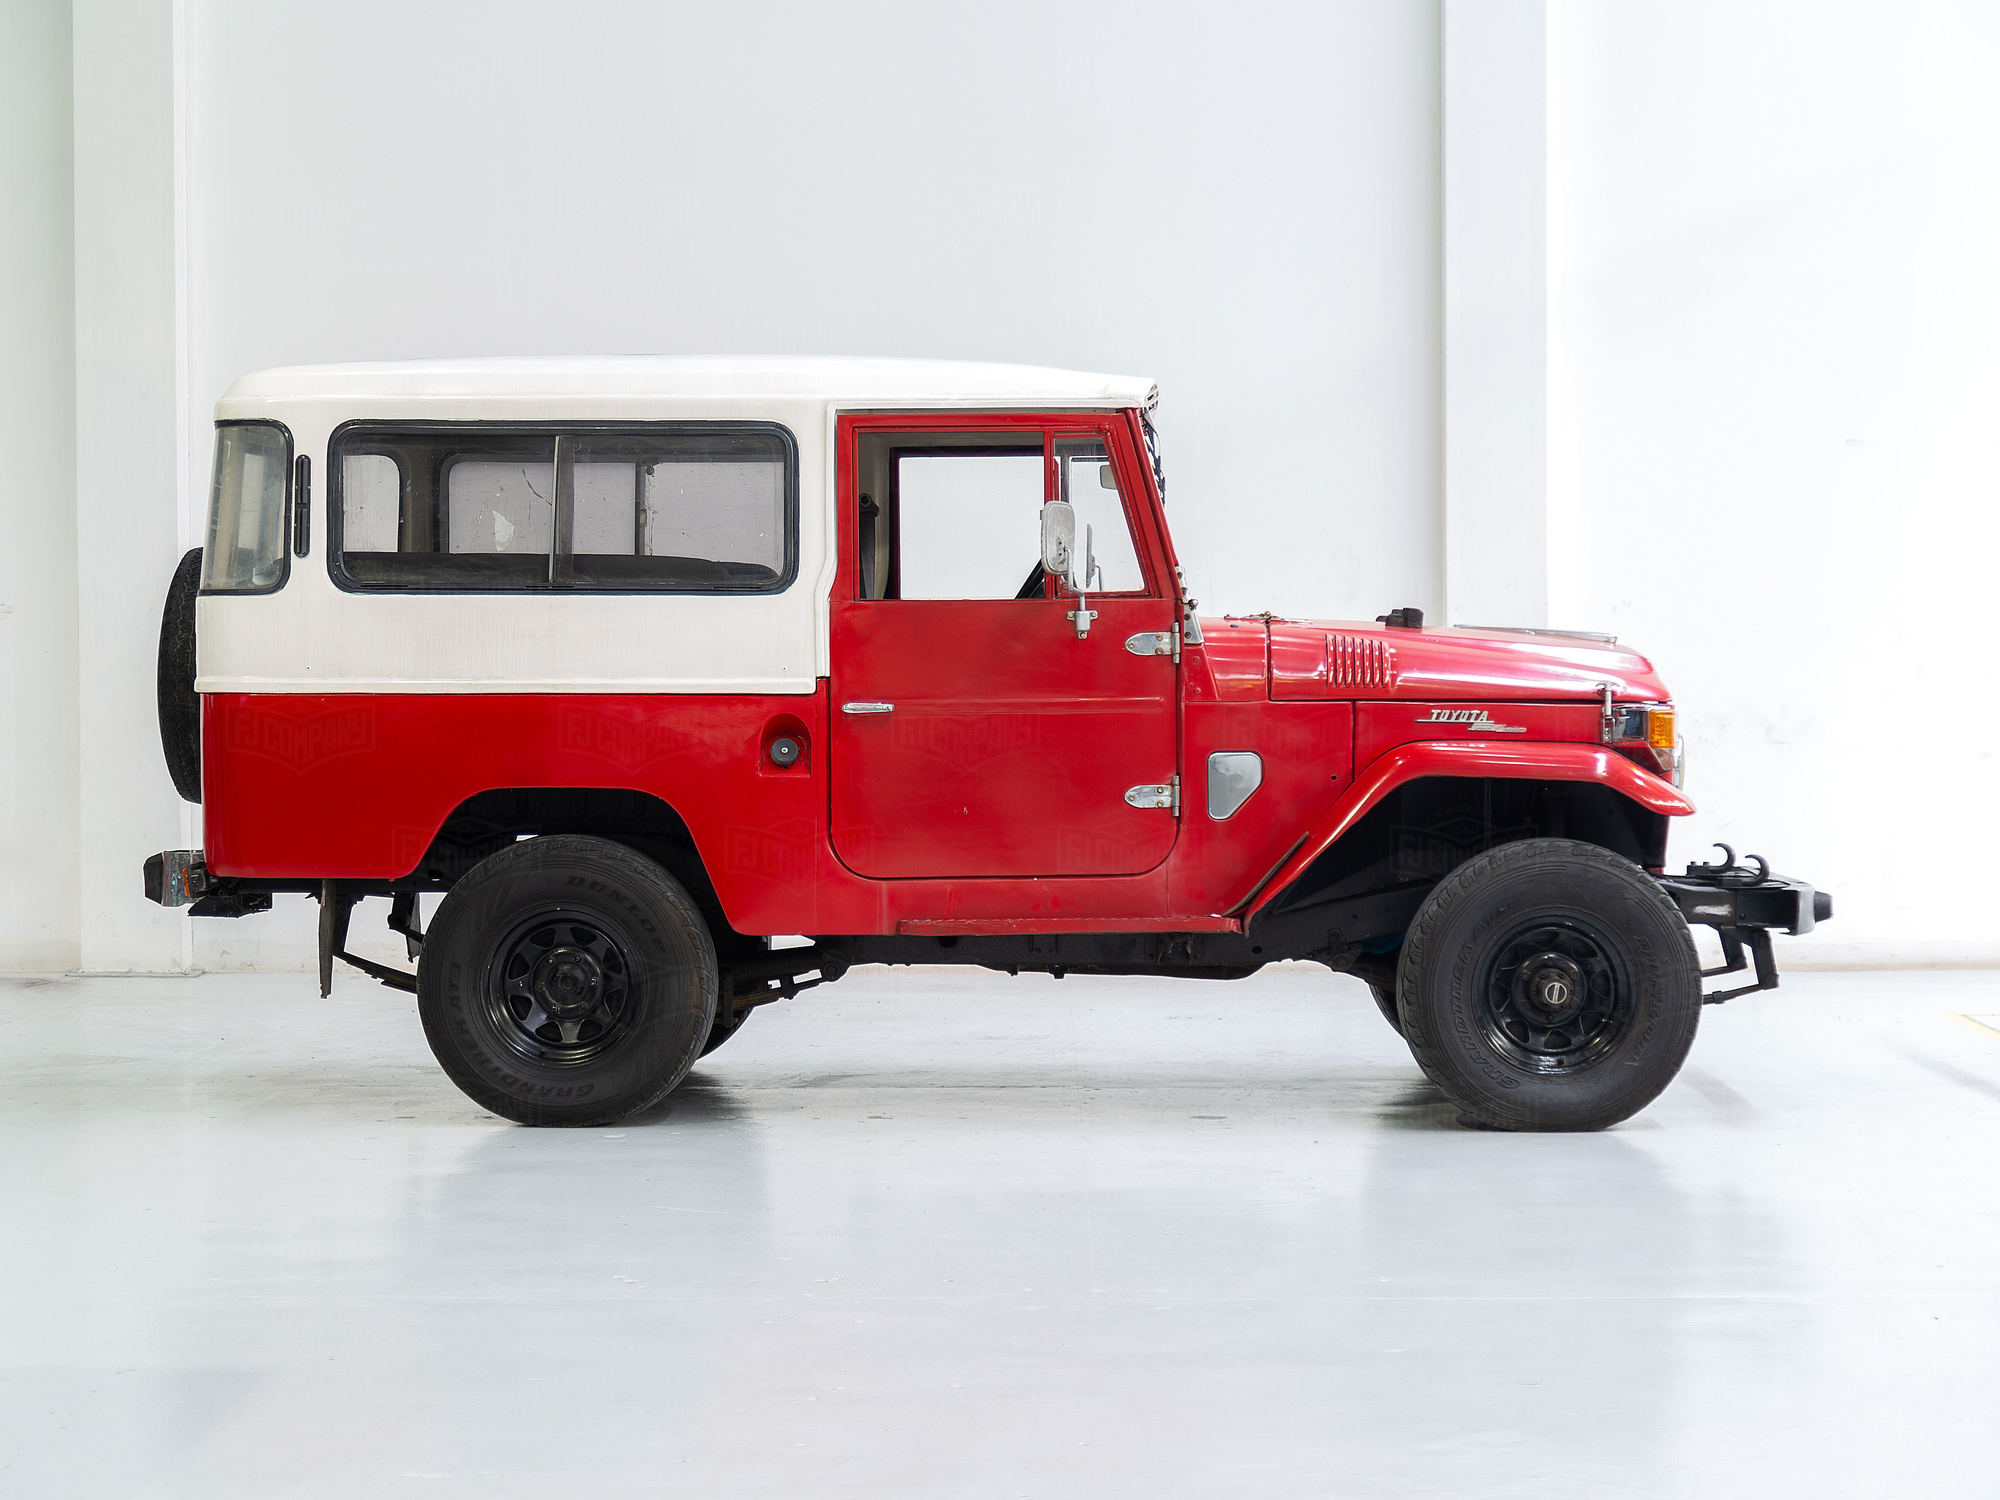 Toyota Land Cruiser 1971 FJ43 Red